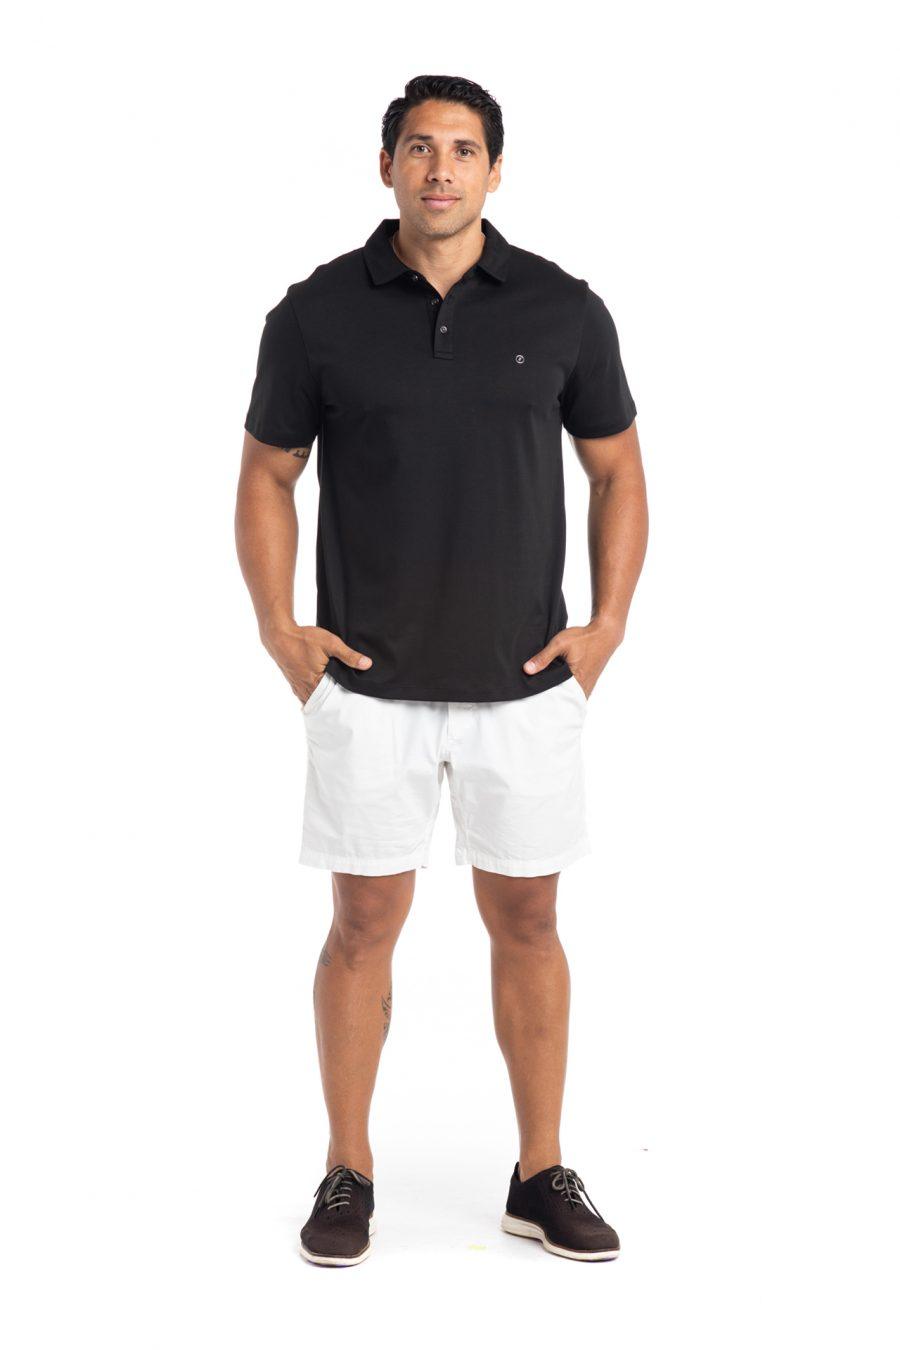 Male model wearing Waikii Polo in Black - Front View